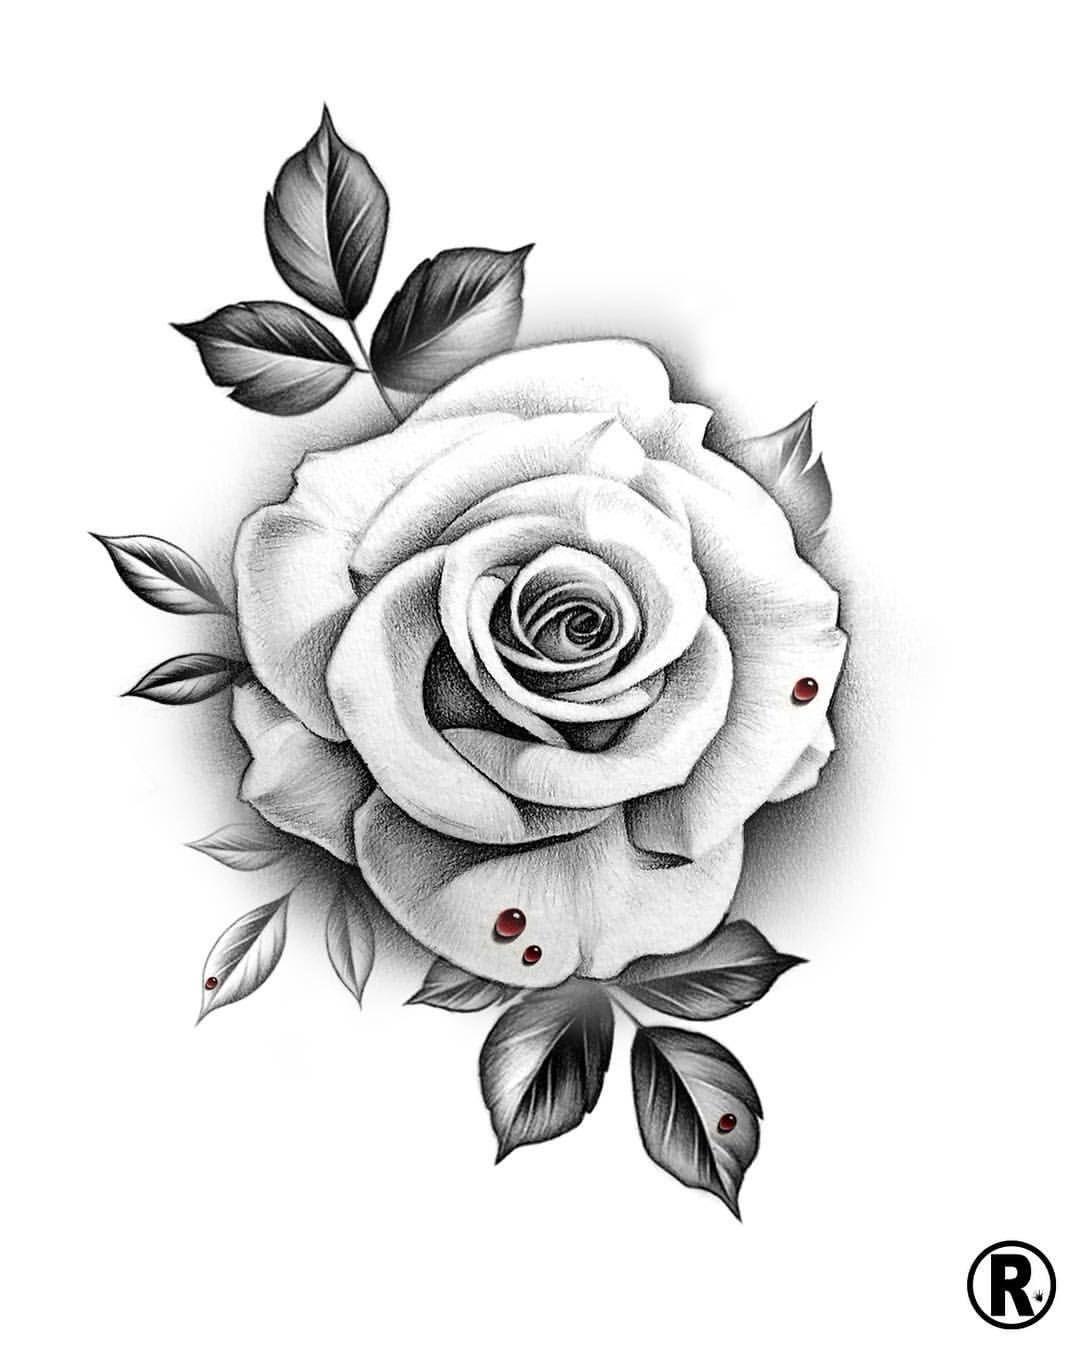 Muestra Arte Diverso En Lapiz Tatuajes De Rosas Dibujos De Rosas Tatuaje De Rosa Realista